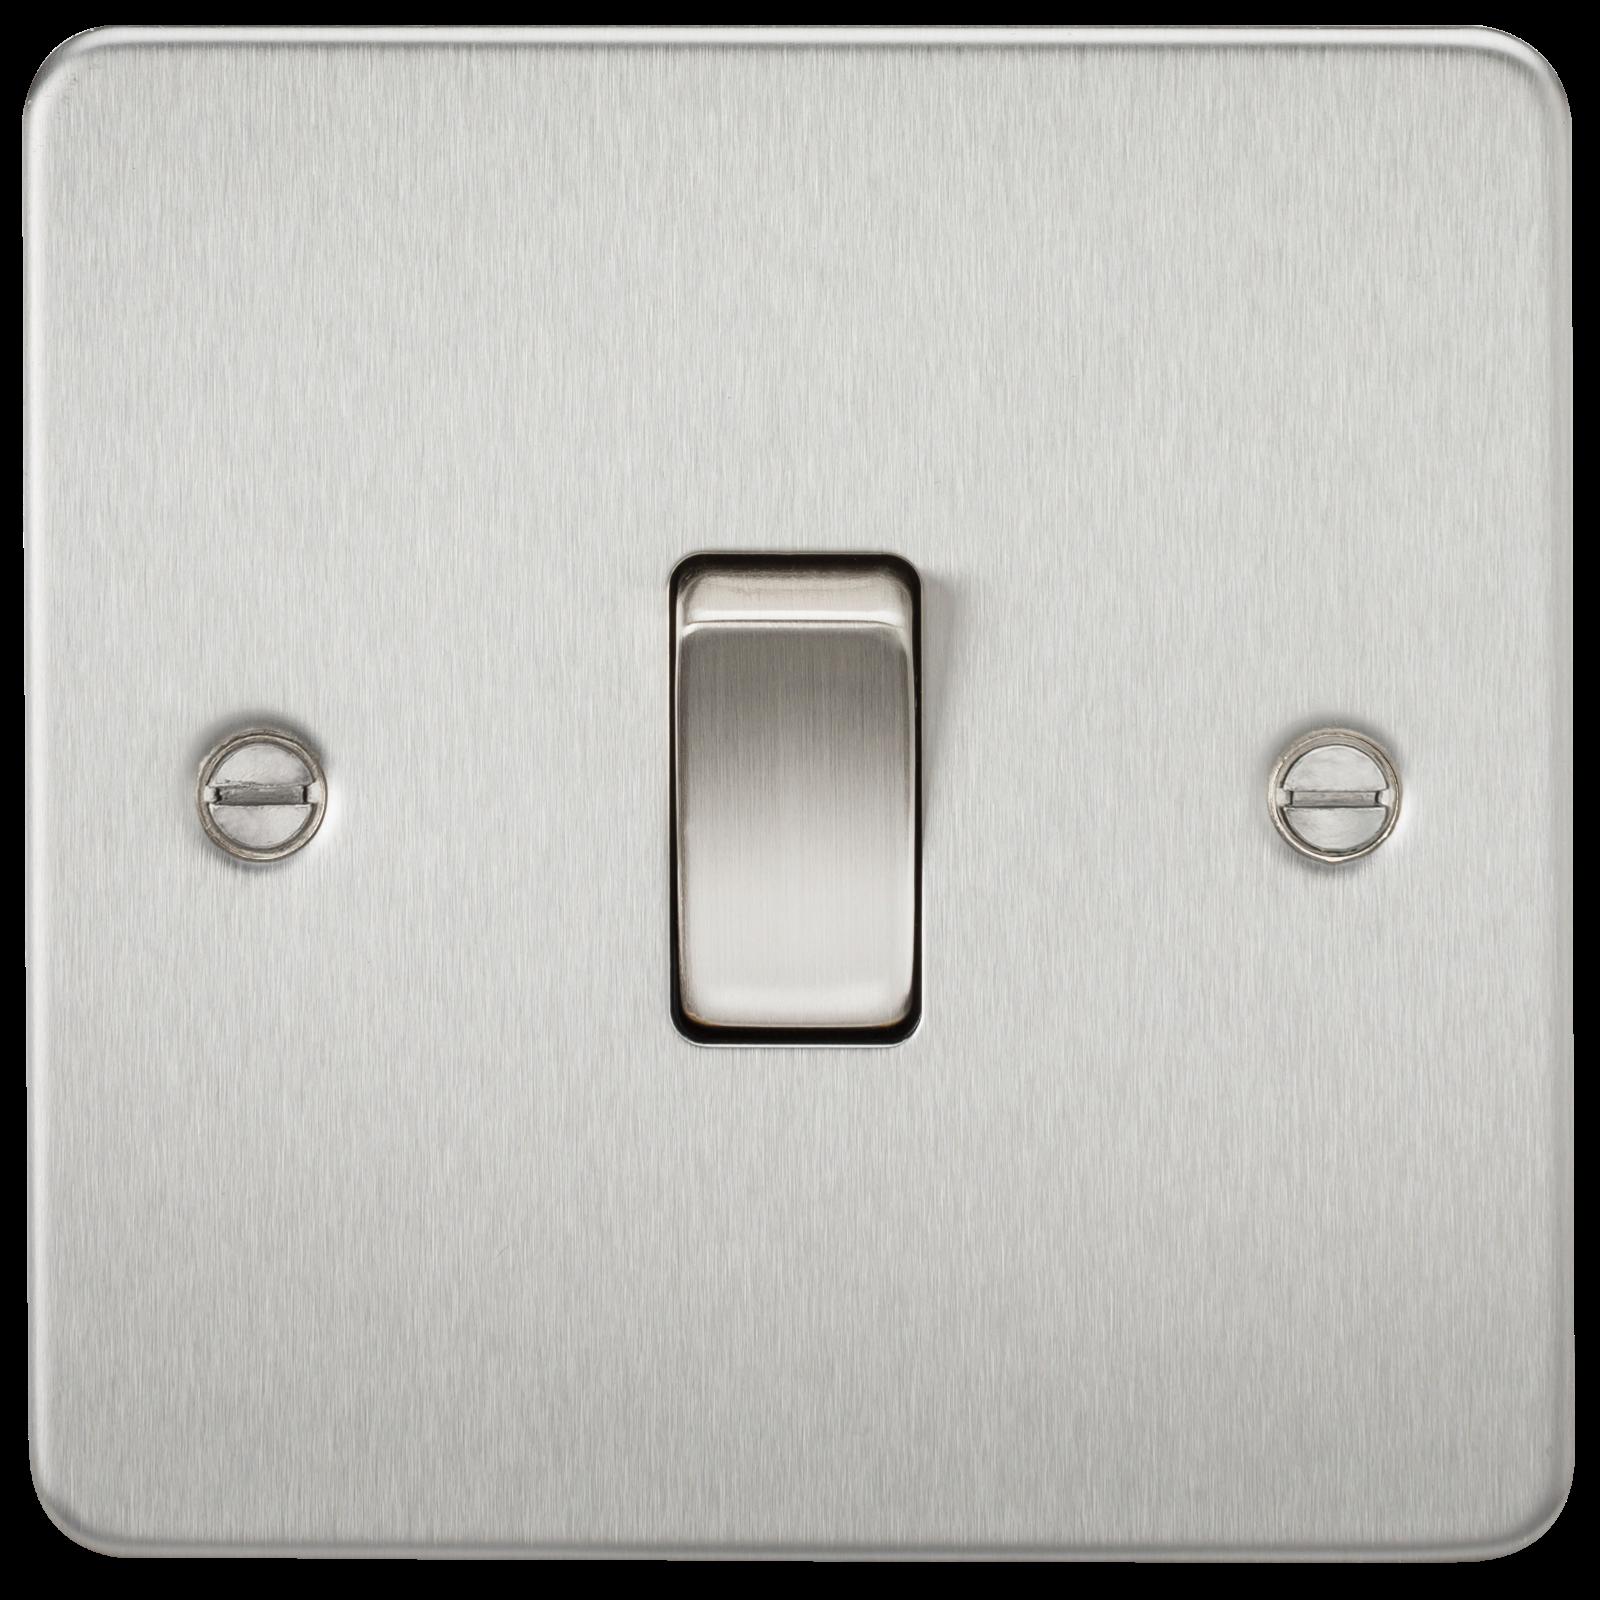 Flat Plate 10a 1g 2 Way Switch Brushed Chrome Wimbledon Lighting For Light